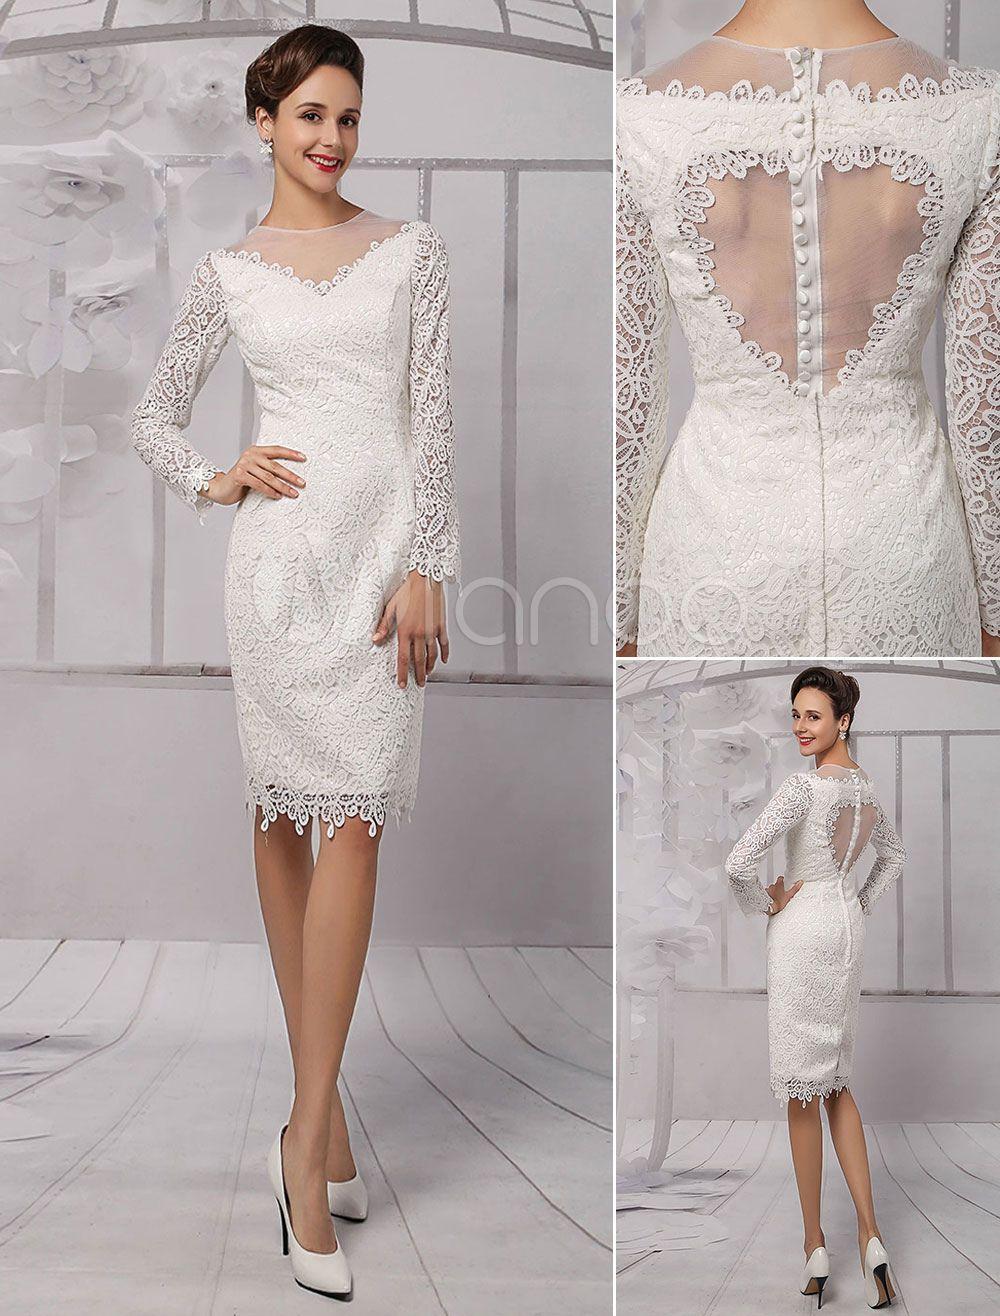 Knee length wedding dress  Lace Illusion Neckline LongSleeves Kneelength Sheath Wedding Dress